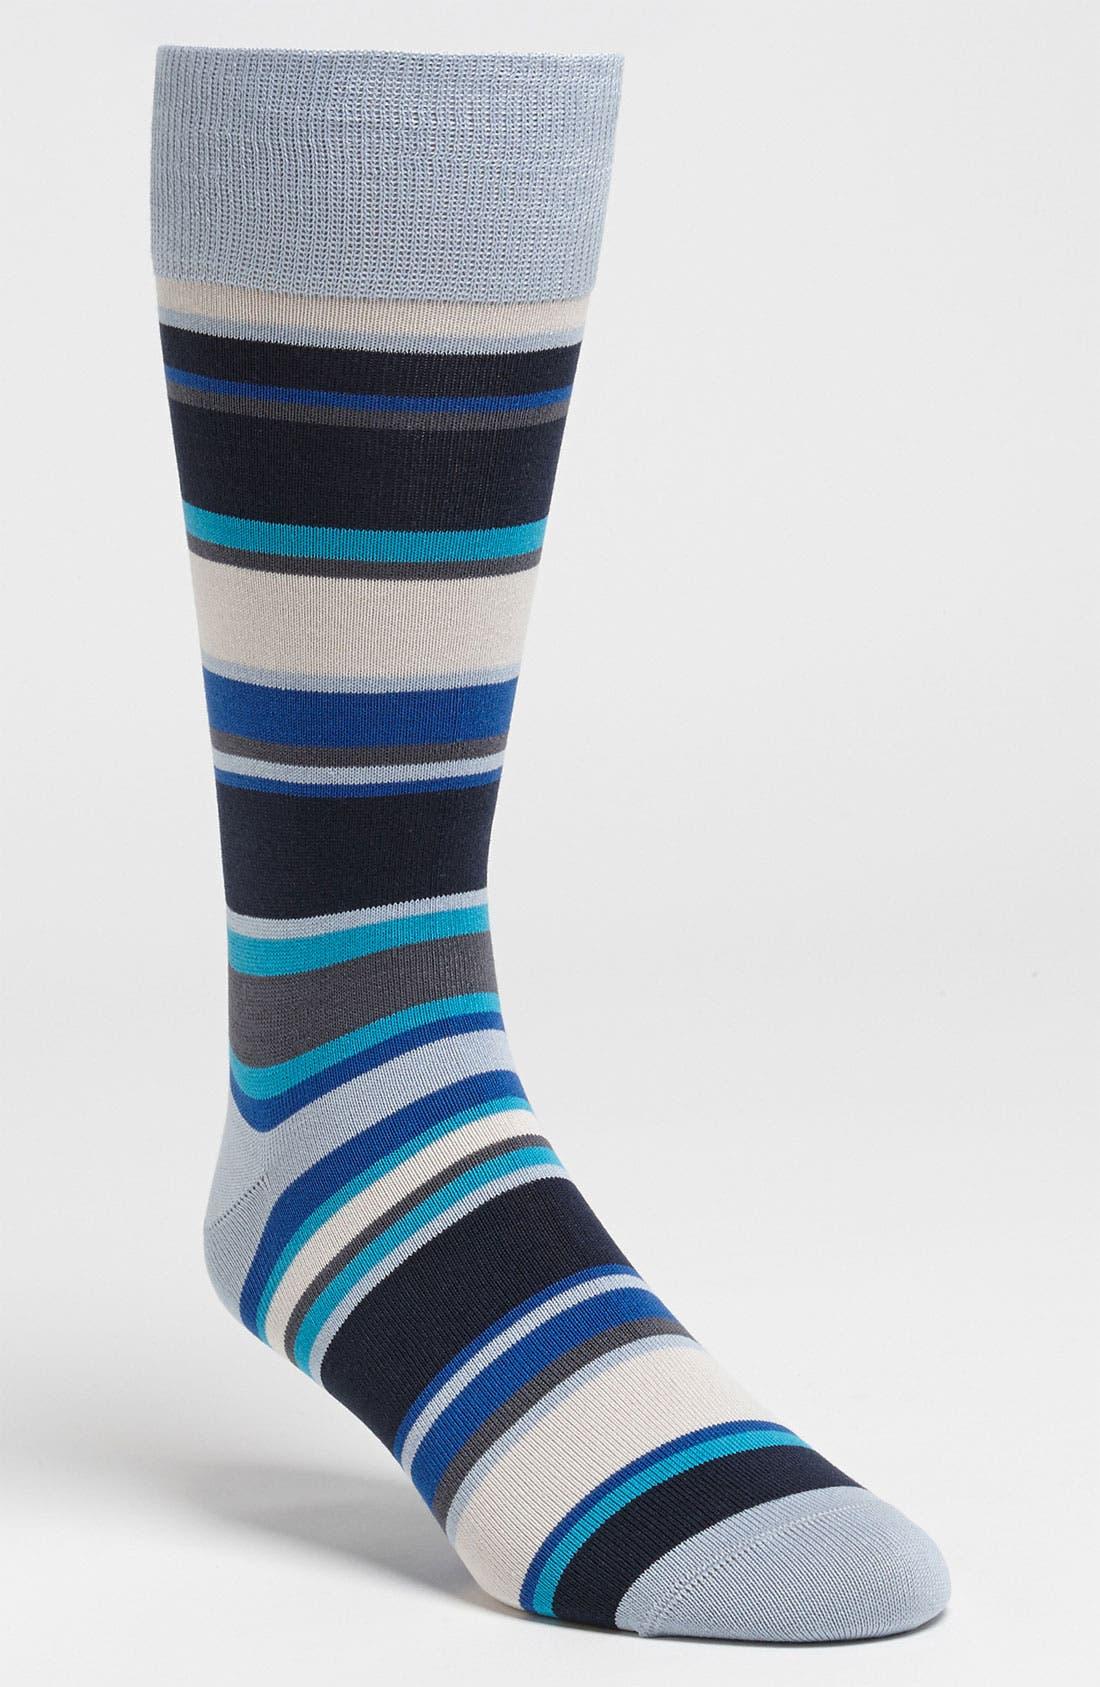 Alternate Image 1 Selected - Paul Smith Accessories 'London' Stripe Socks